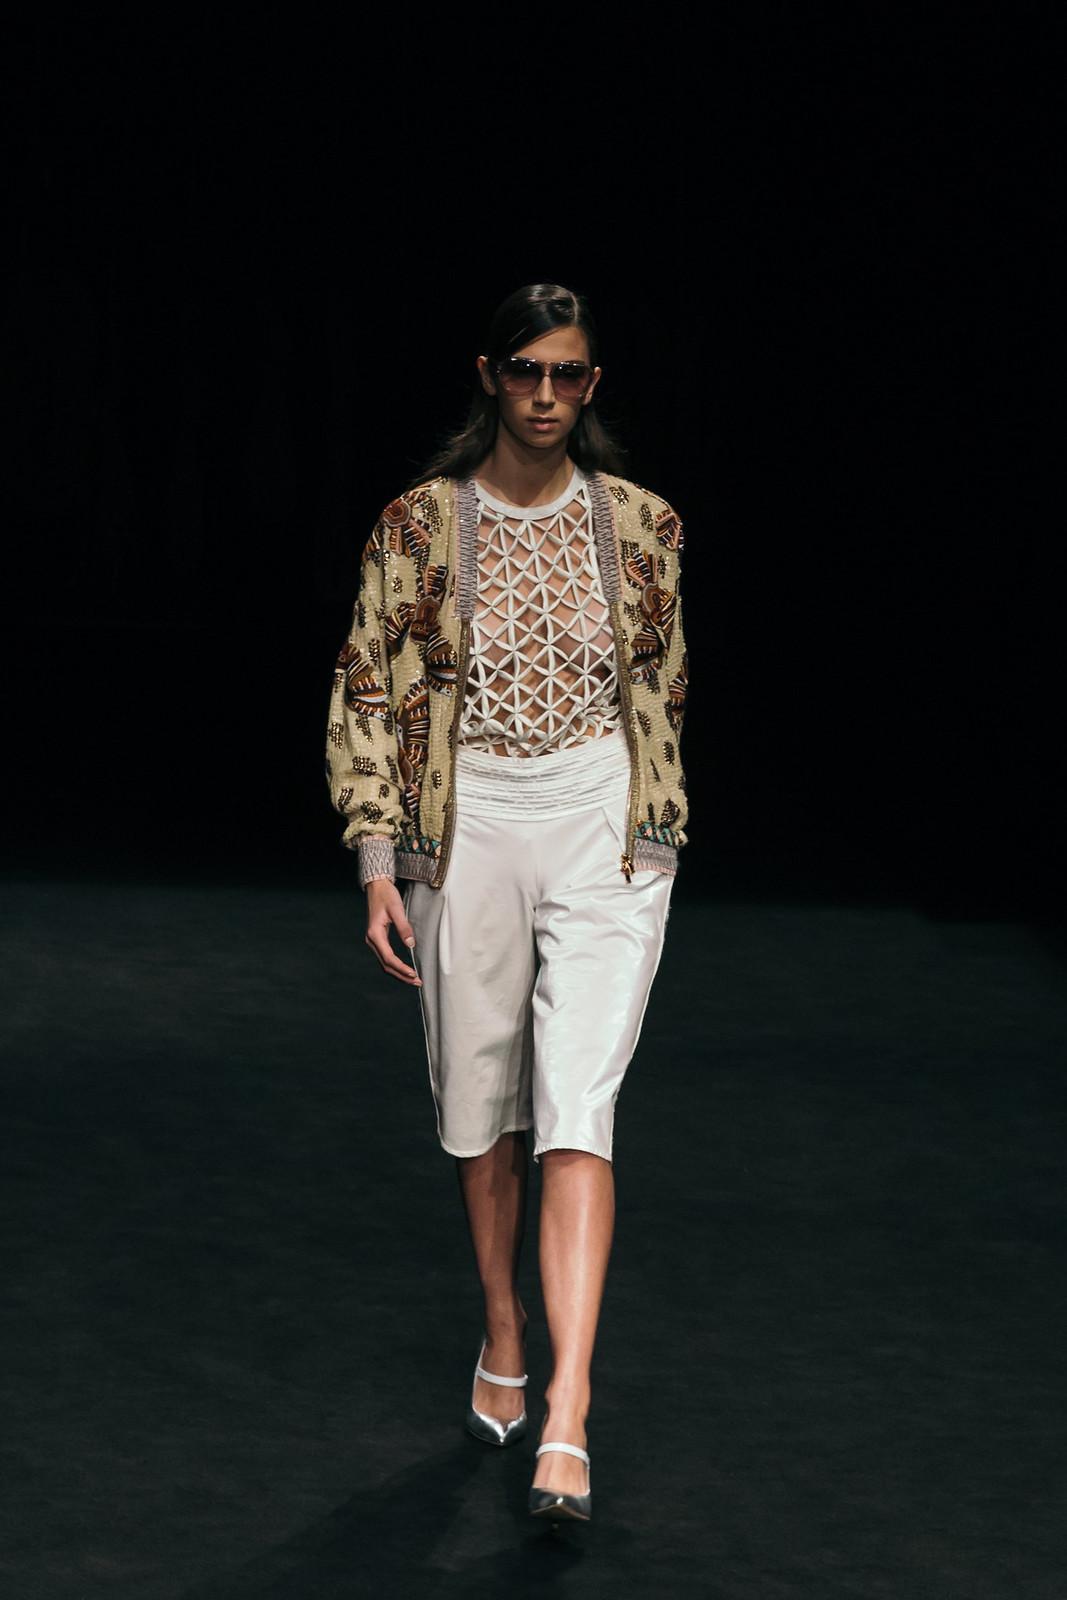 Jessie Chanes - Seams for a desire - 080 Bacelona Fashion #080bcnfasion -10